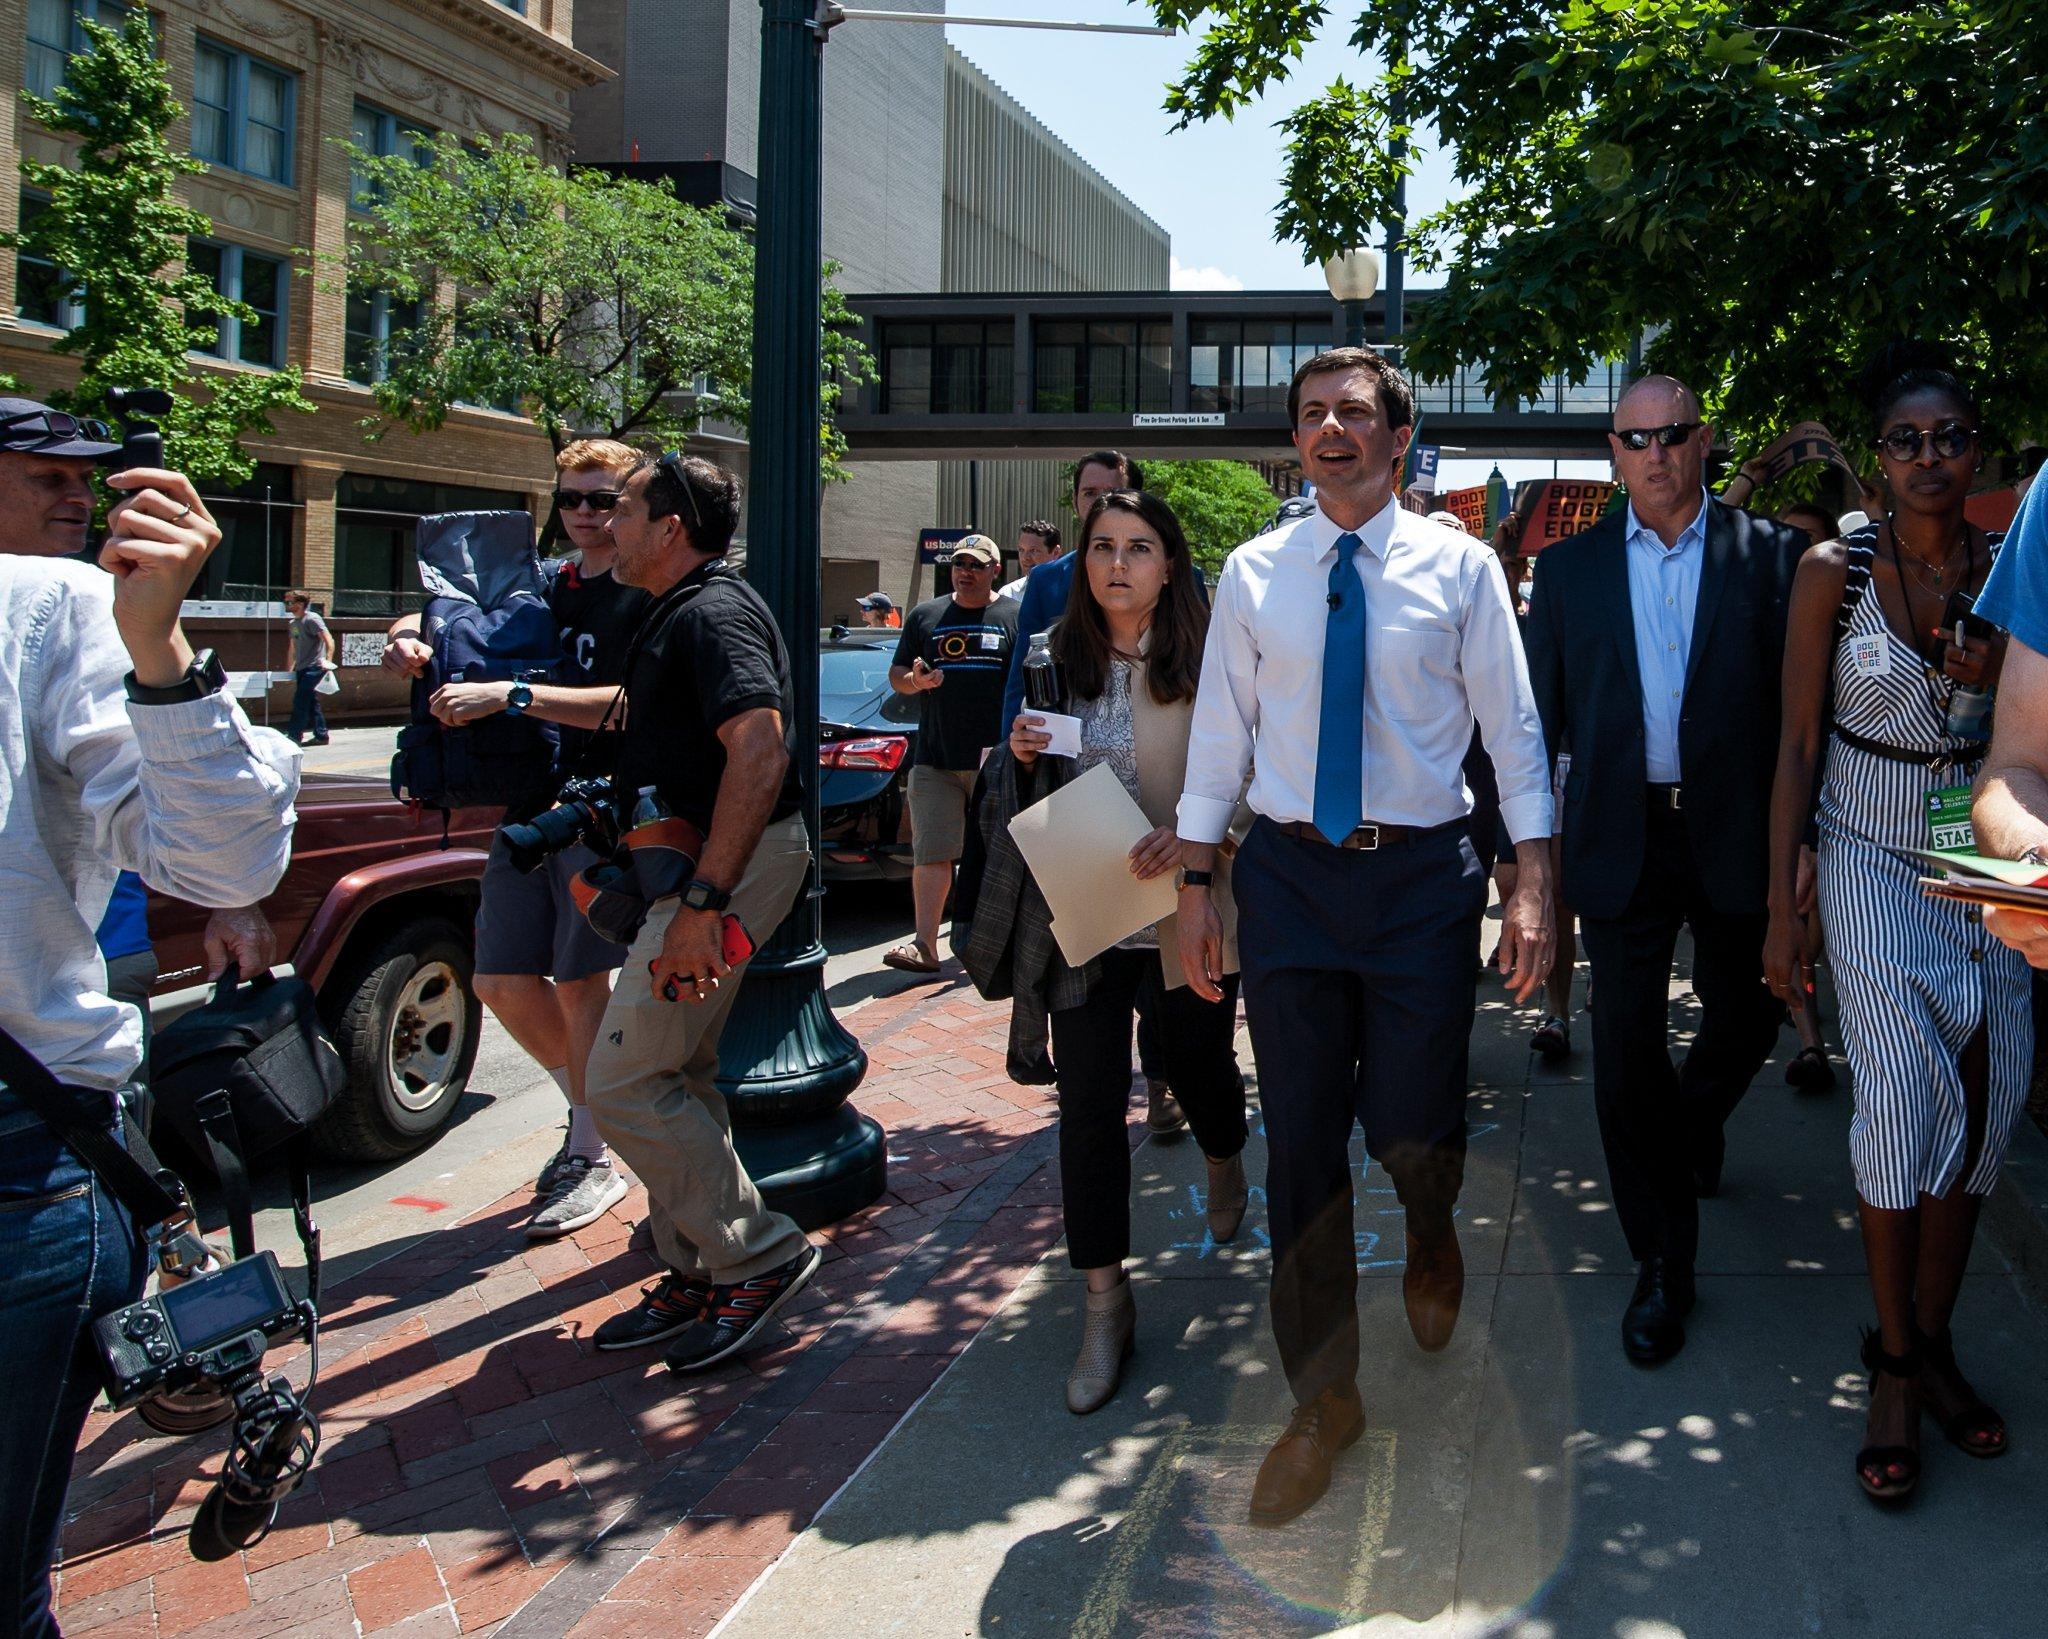 Pete Buttigieg walking through downtown Cedar Rapids, Iowa with supporters